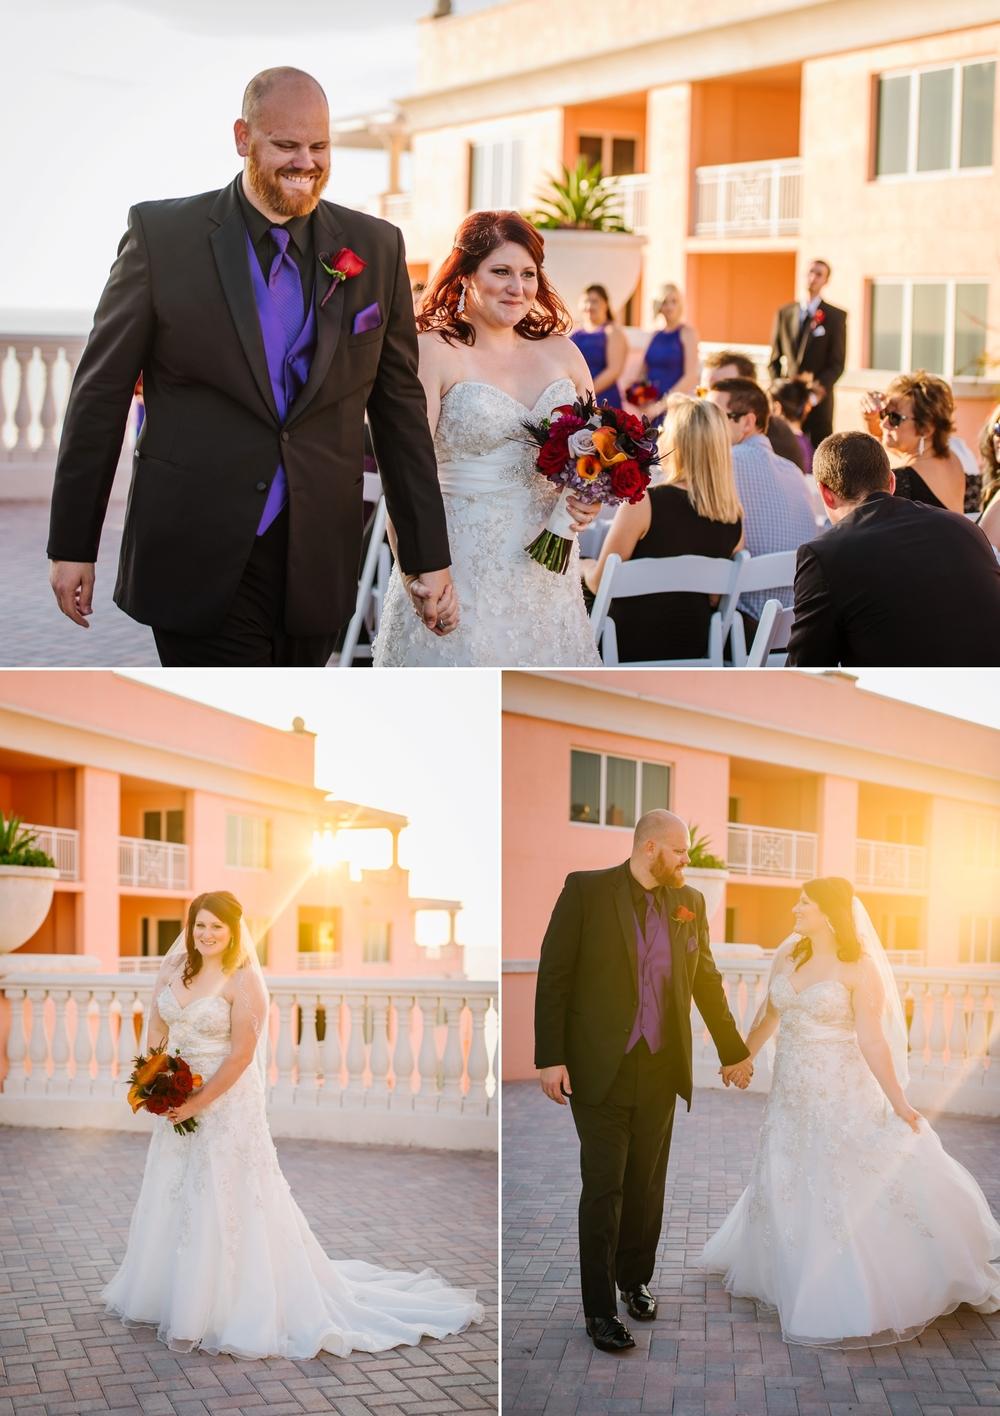 clearwater-beach-hyatt-masquerade-ballroom-themed-wedding-photograpy_0014.jpg